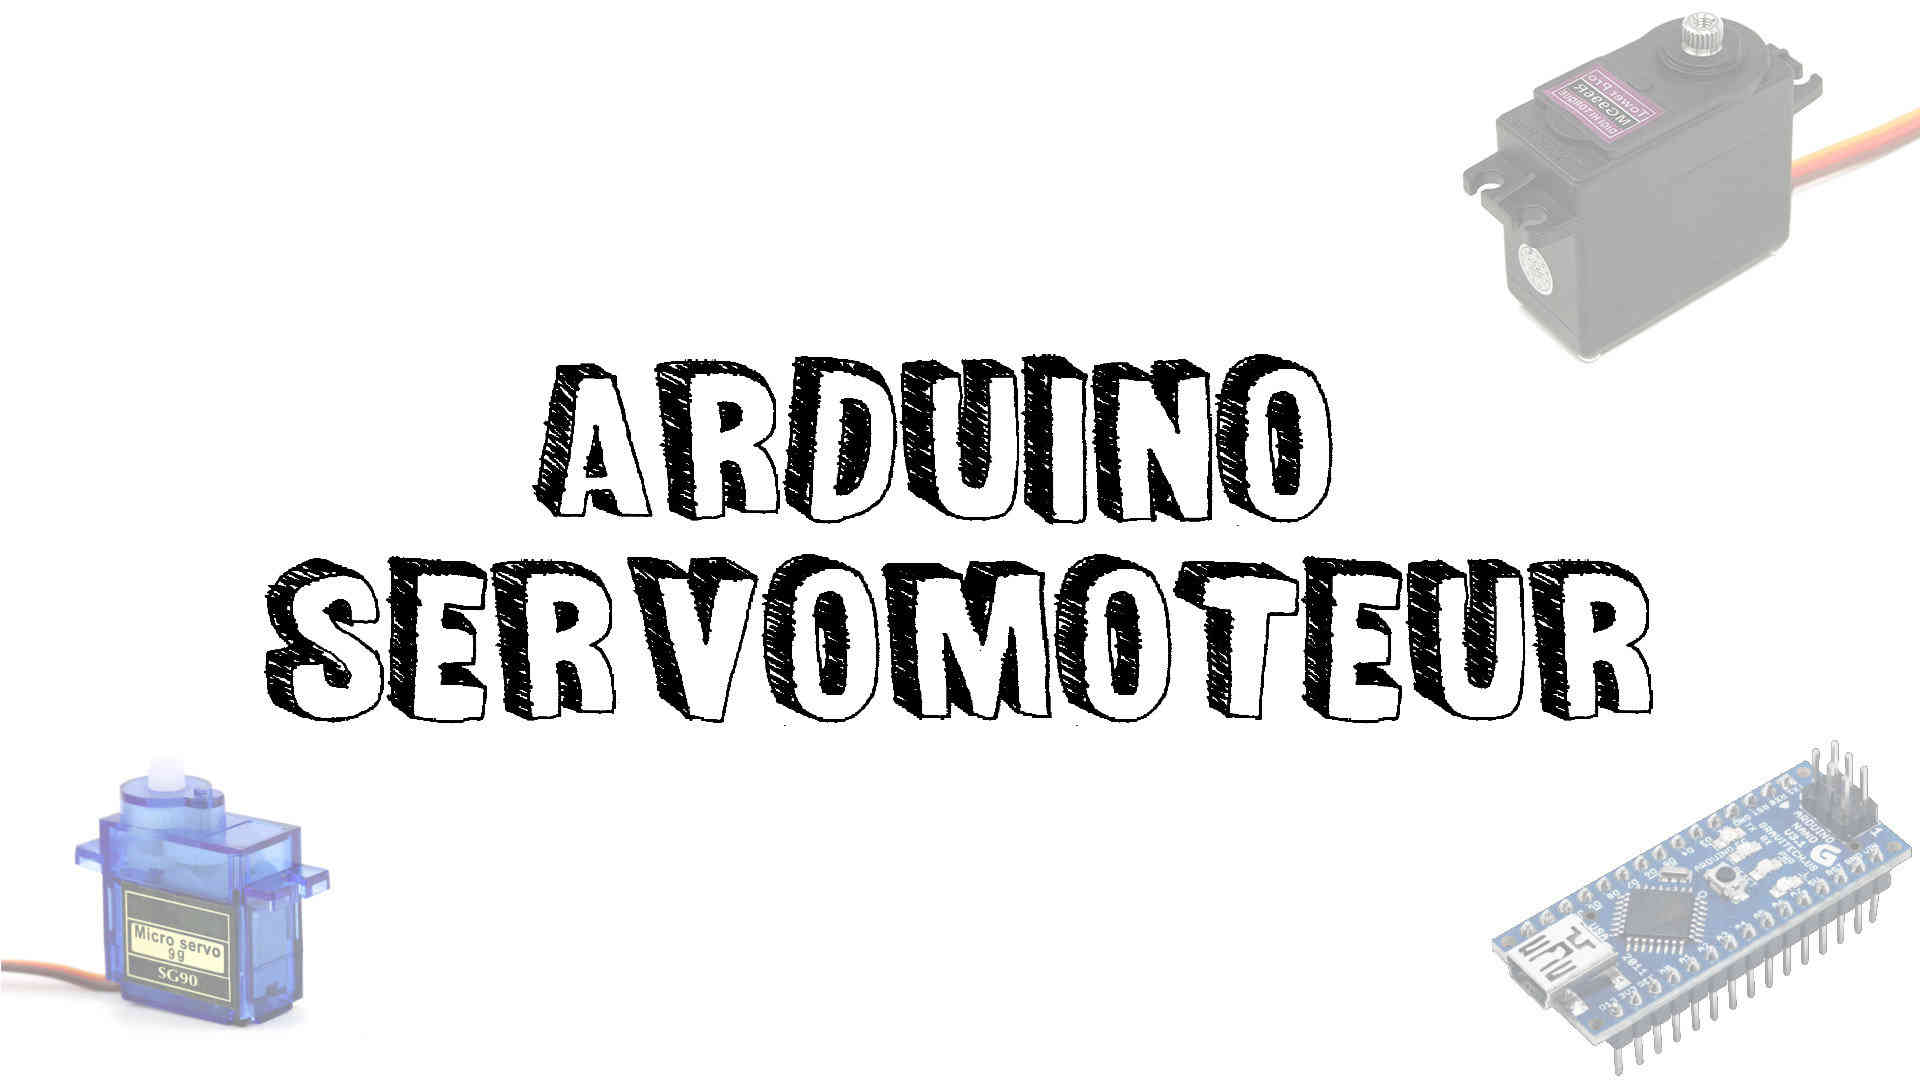 Low servomoteur